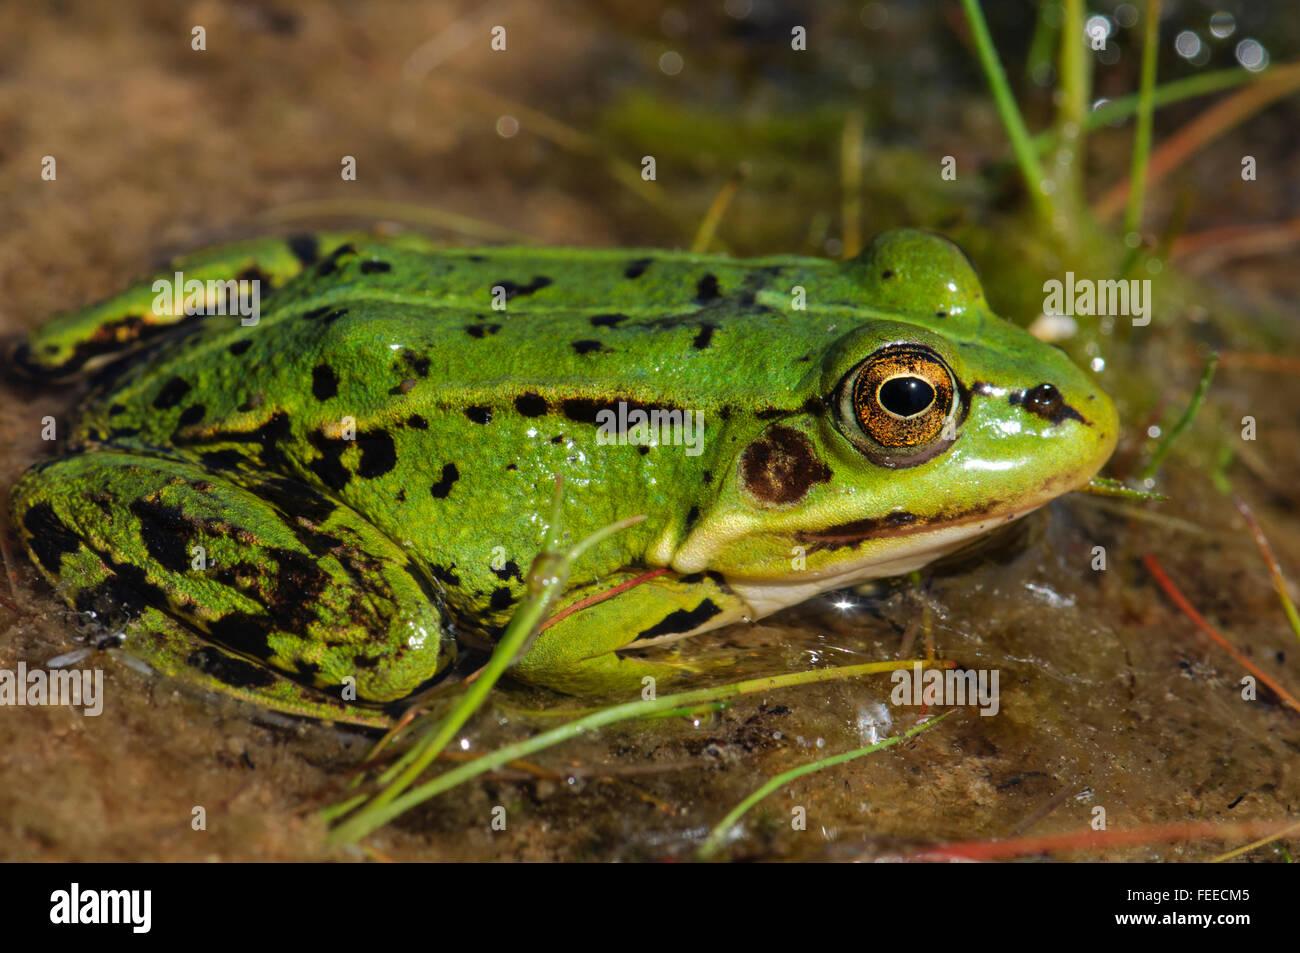 edible green frog rana esculenta stock photo royalty free image